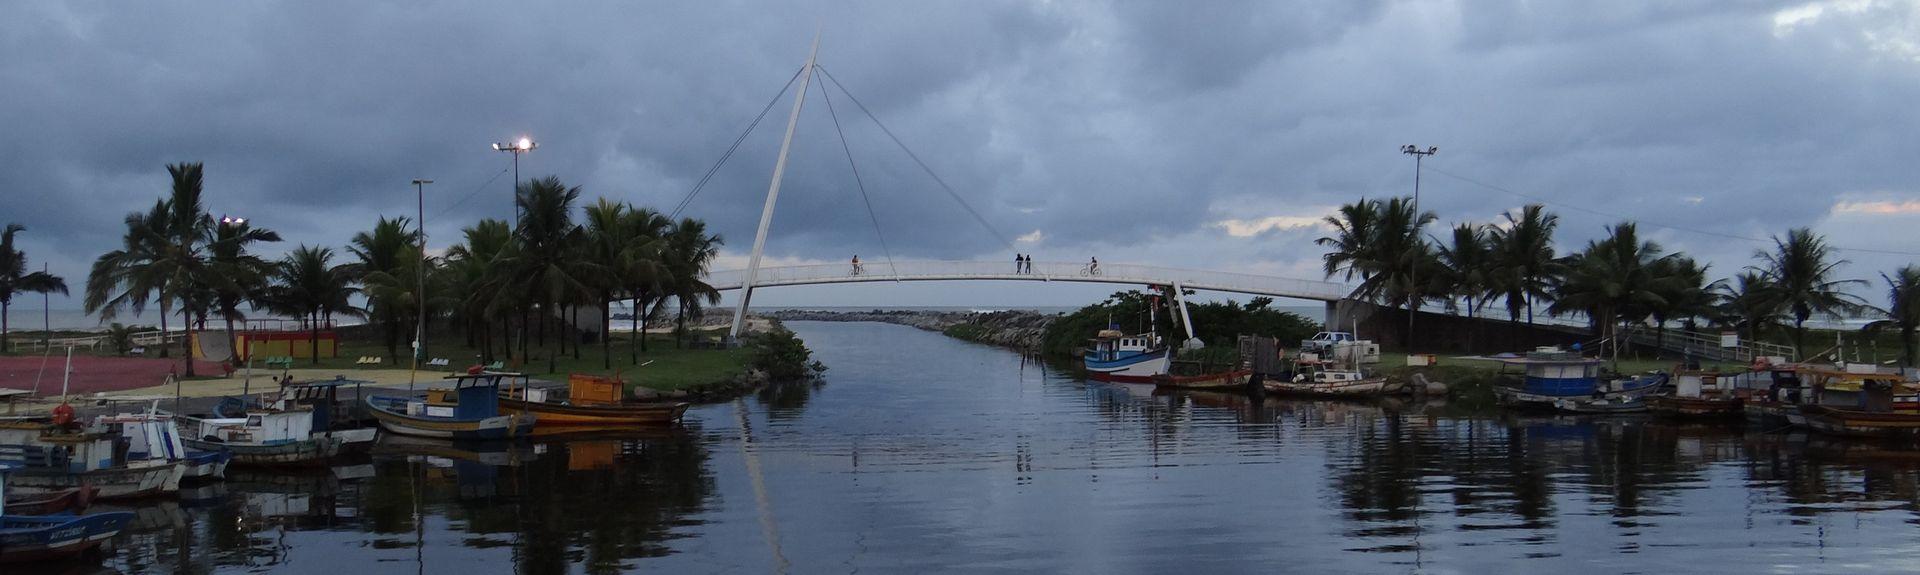 Aracruz, Region Südosten, Brasilien